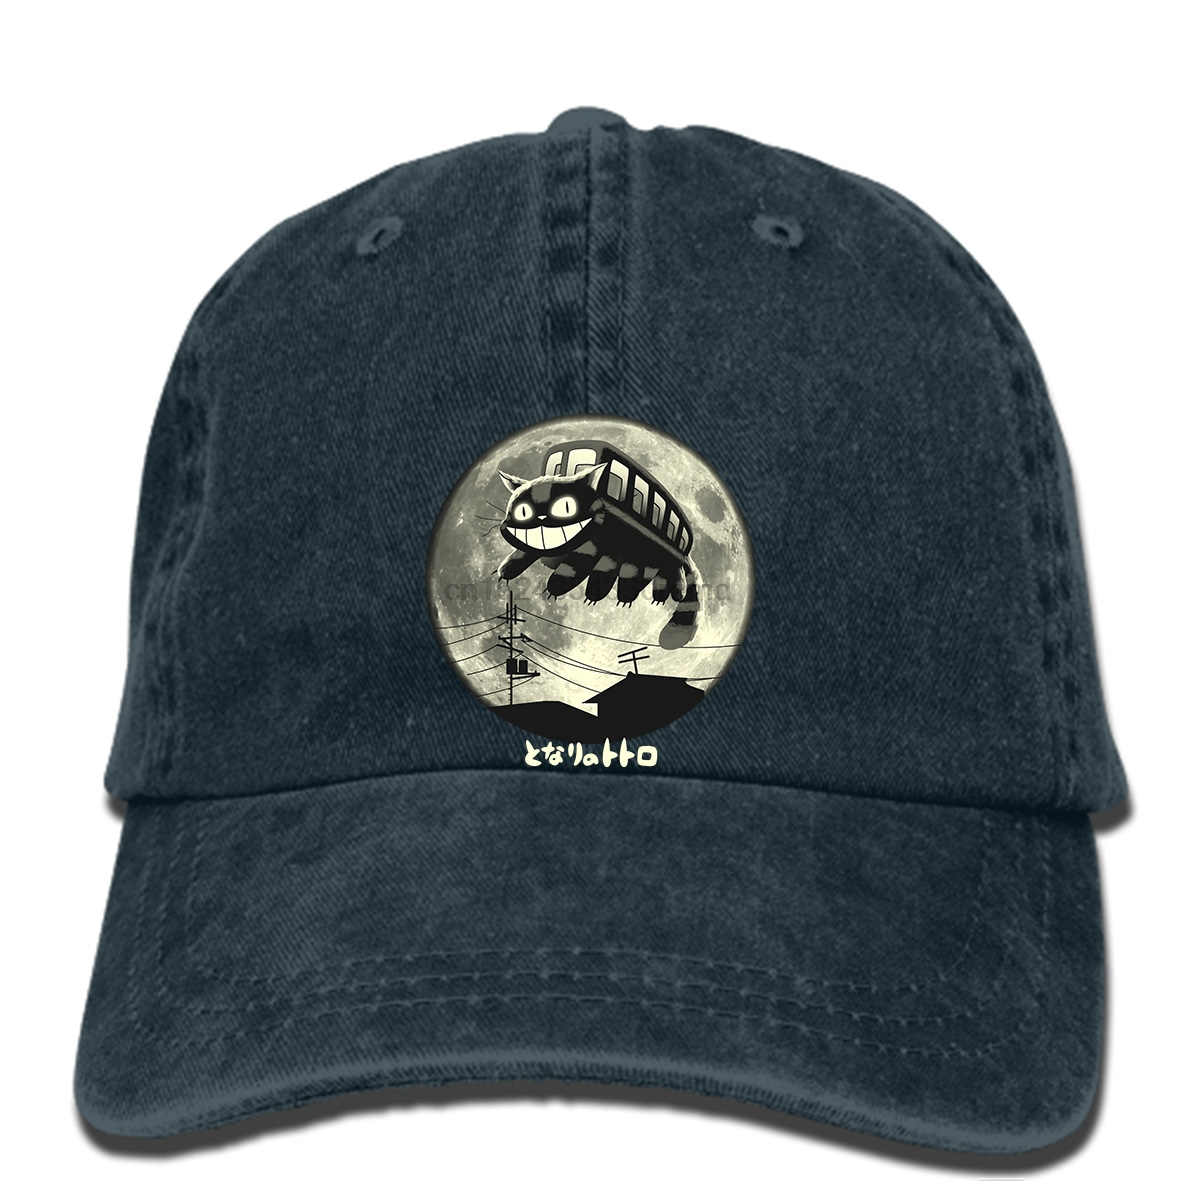 more photos e474e 9c7df Buy comedy hats and get free shipping on AliExpress.com